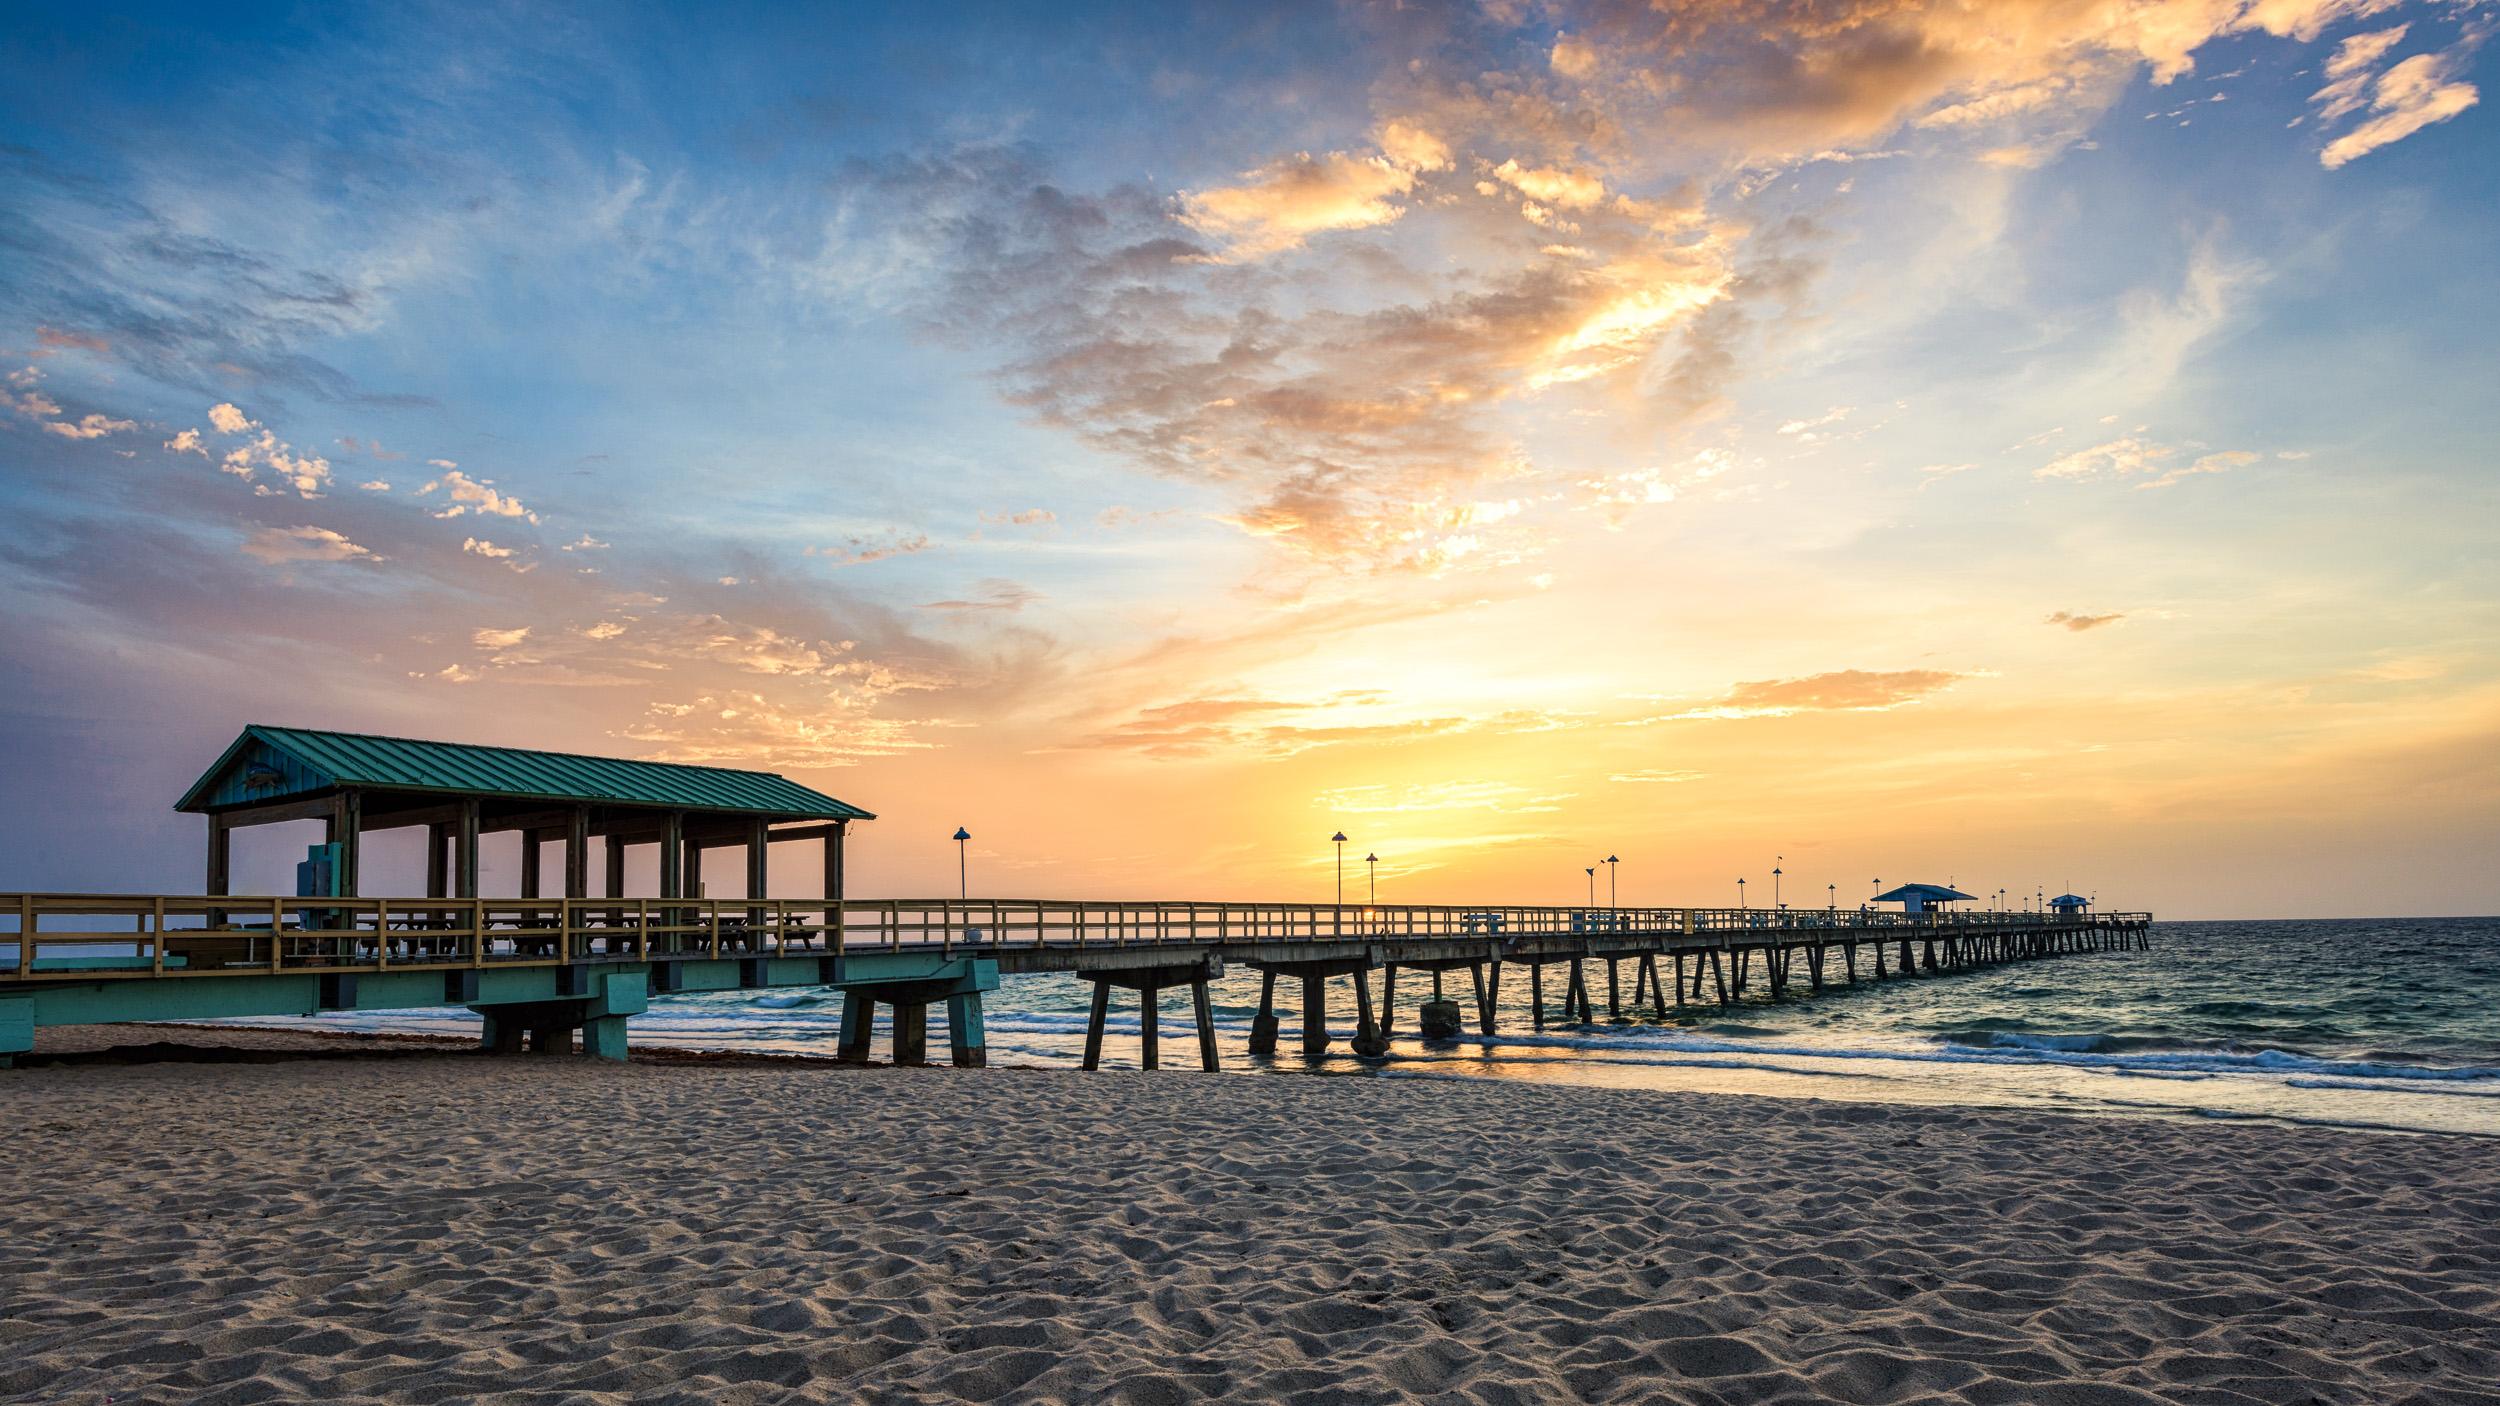 Anglins_Fishing_pier_sunrise_Miami_Fort_Lauderdale_commercial_photographer_Franklin_Castillo.jpg